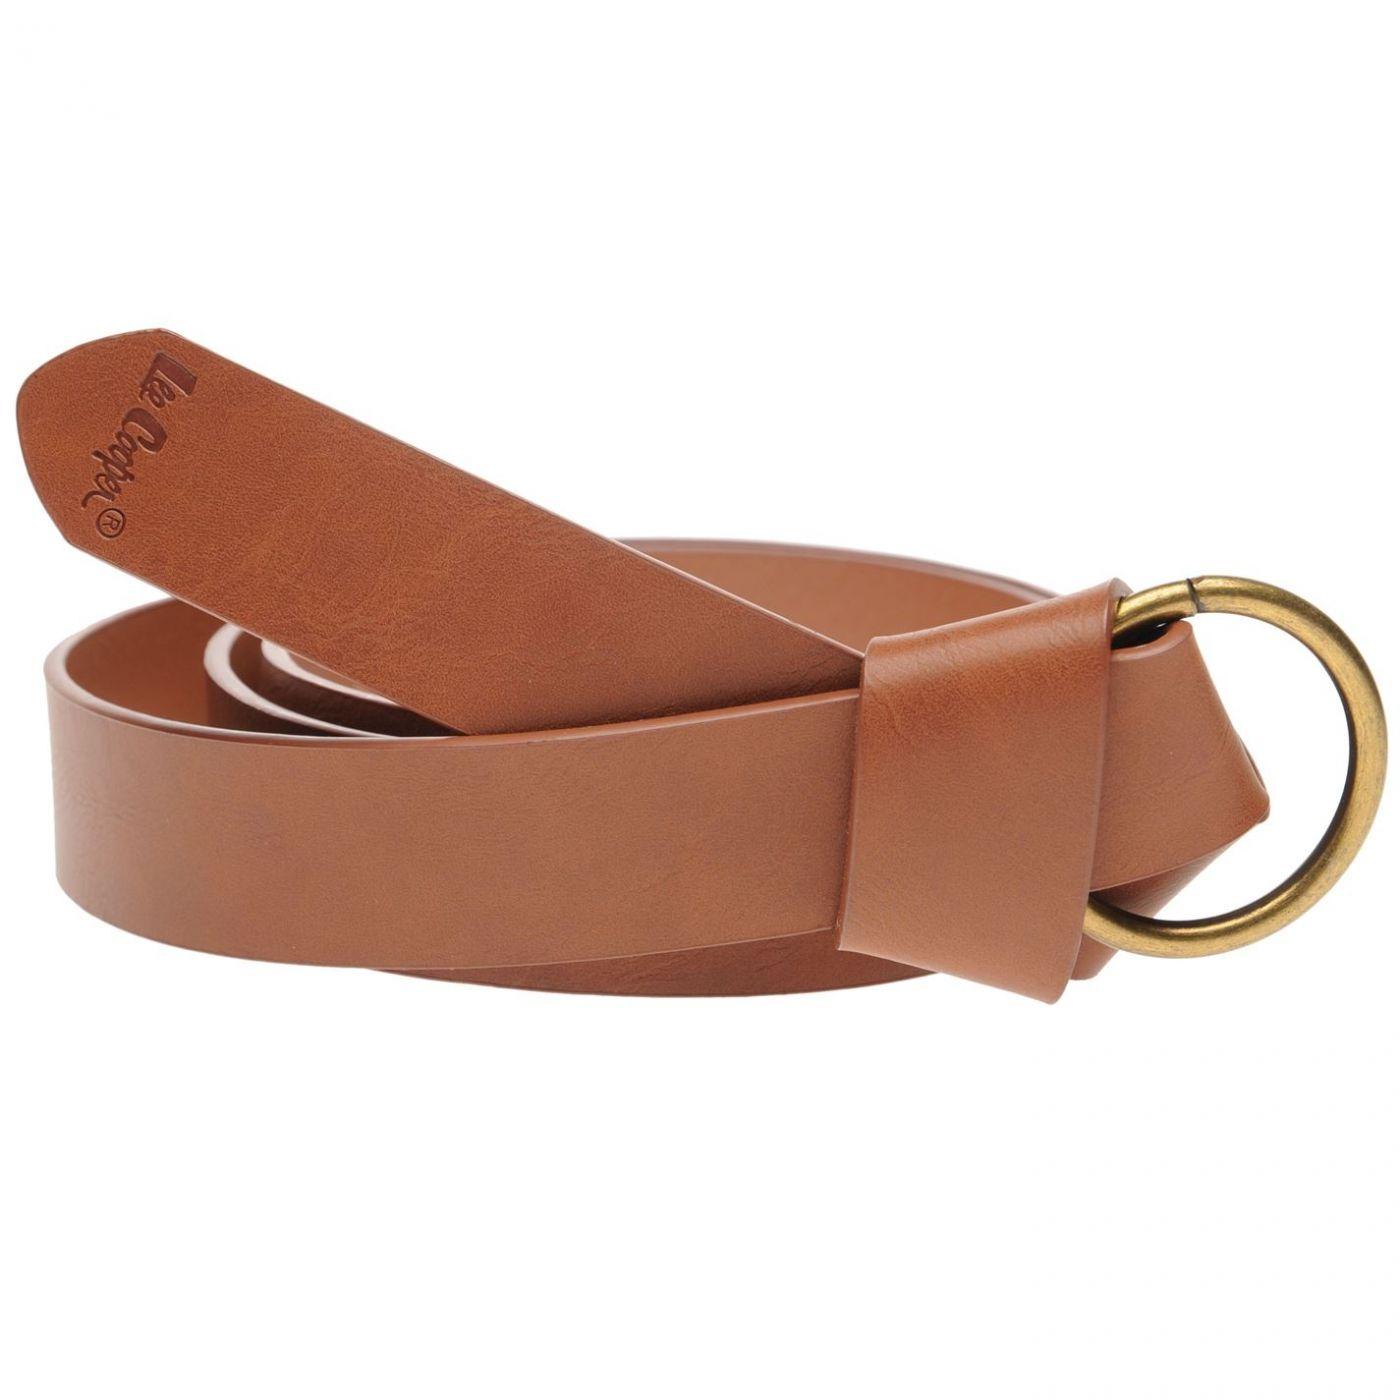 Lee Cooper Cooper Knot Belt Ld81